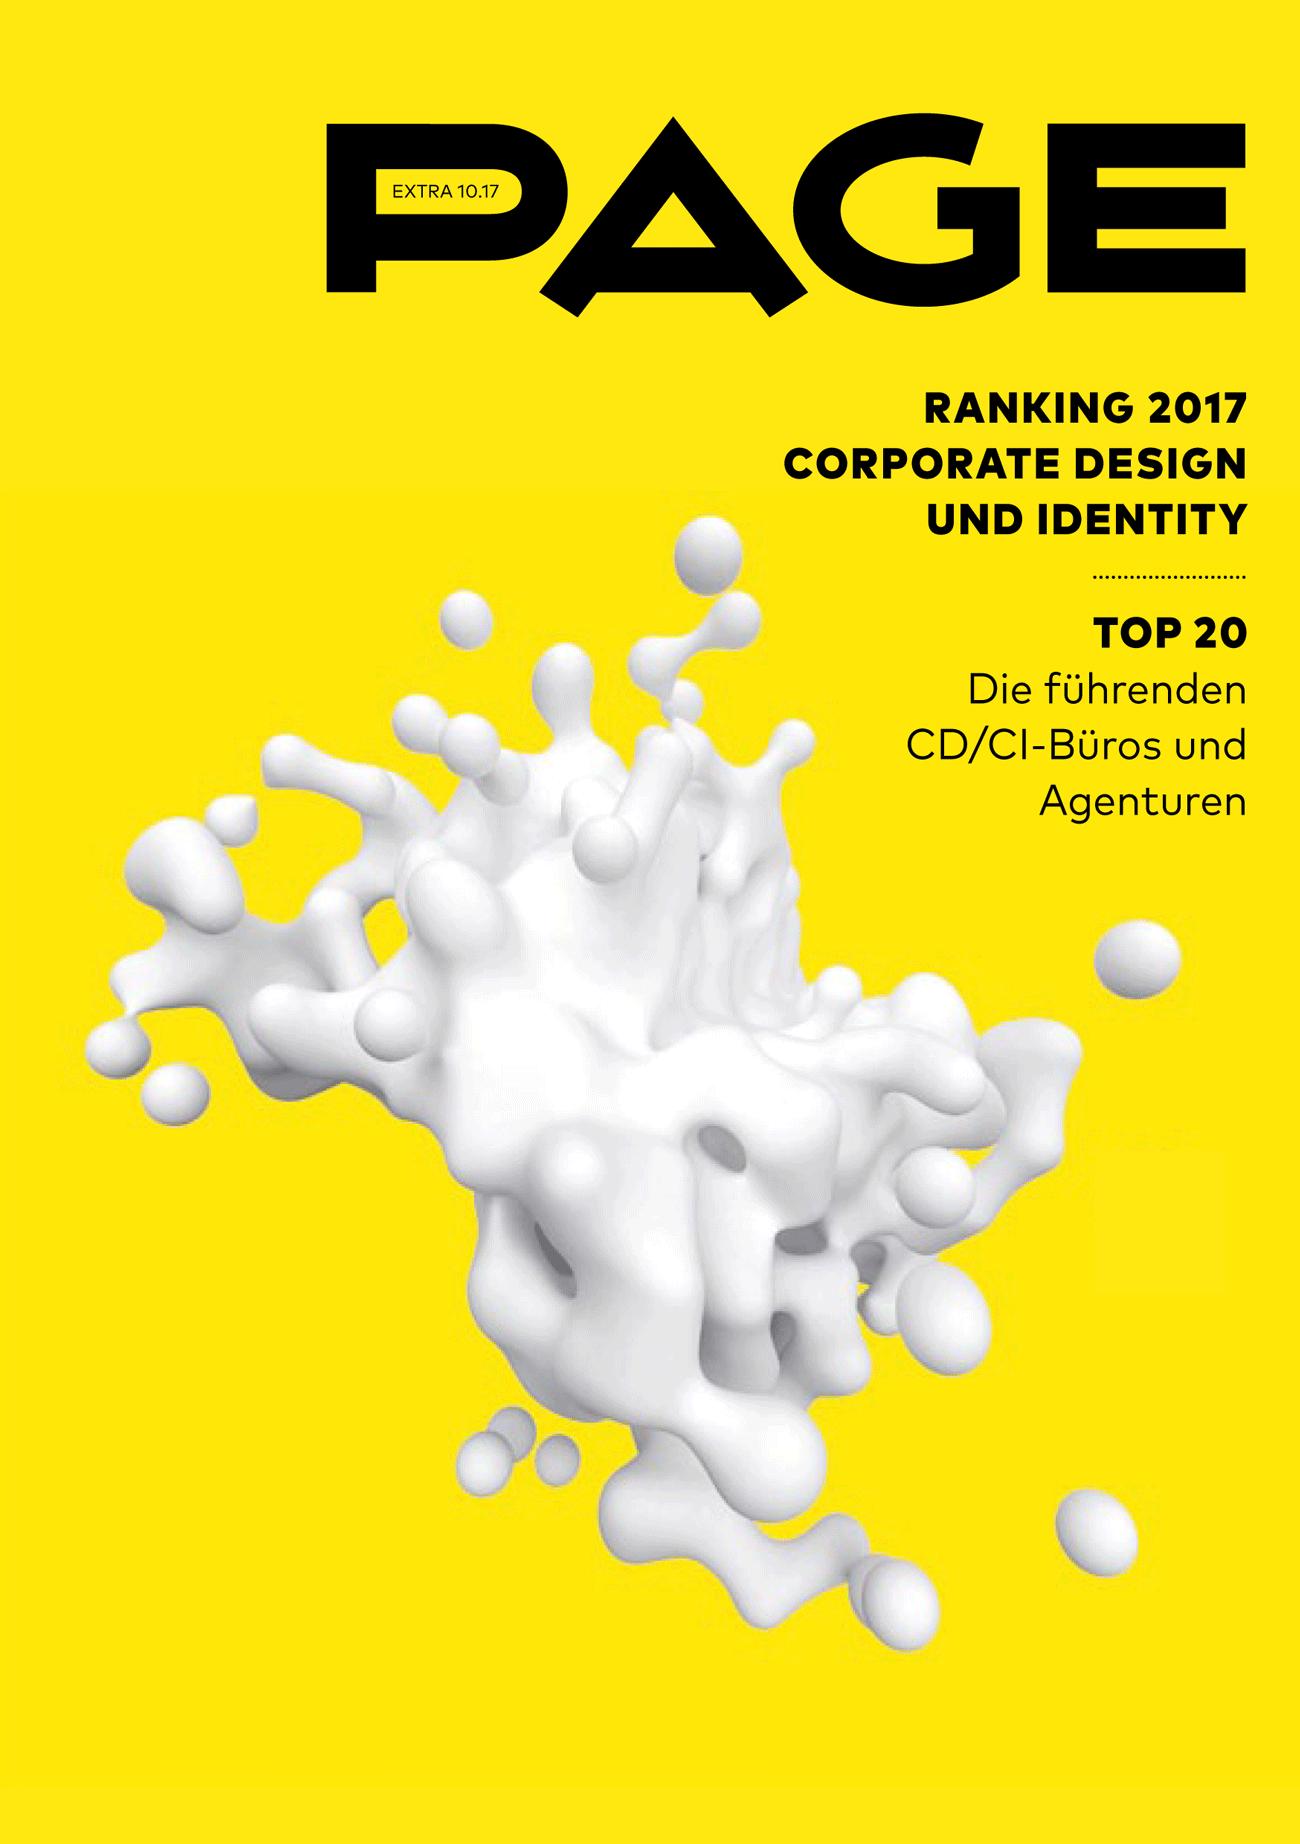 Corporate Design, Corporate Identity, PAGE Ranking